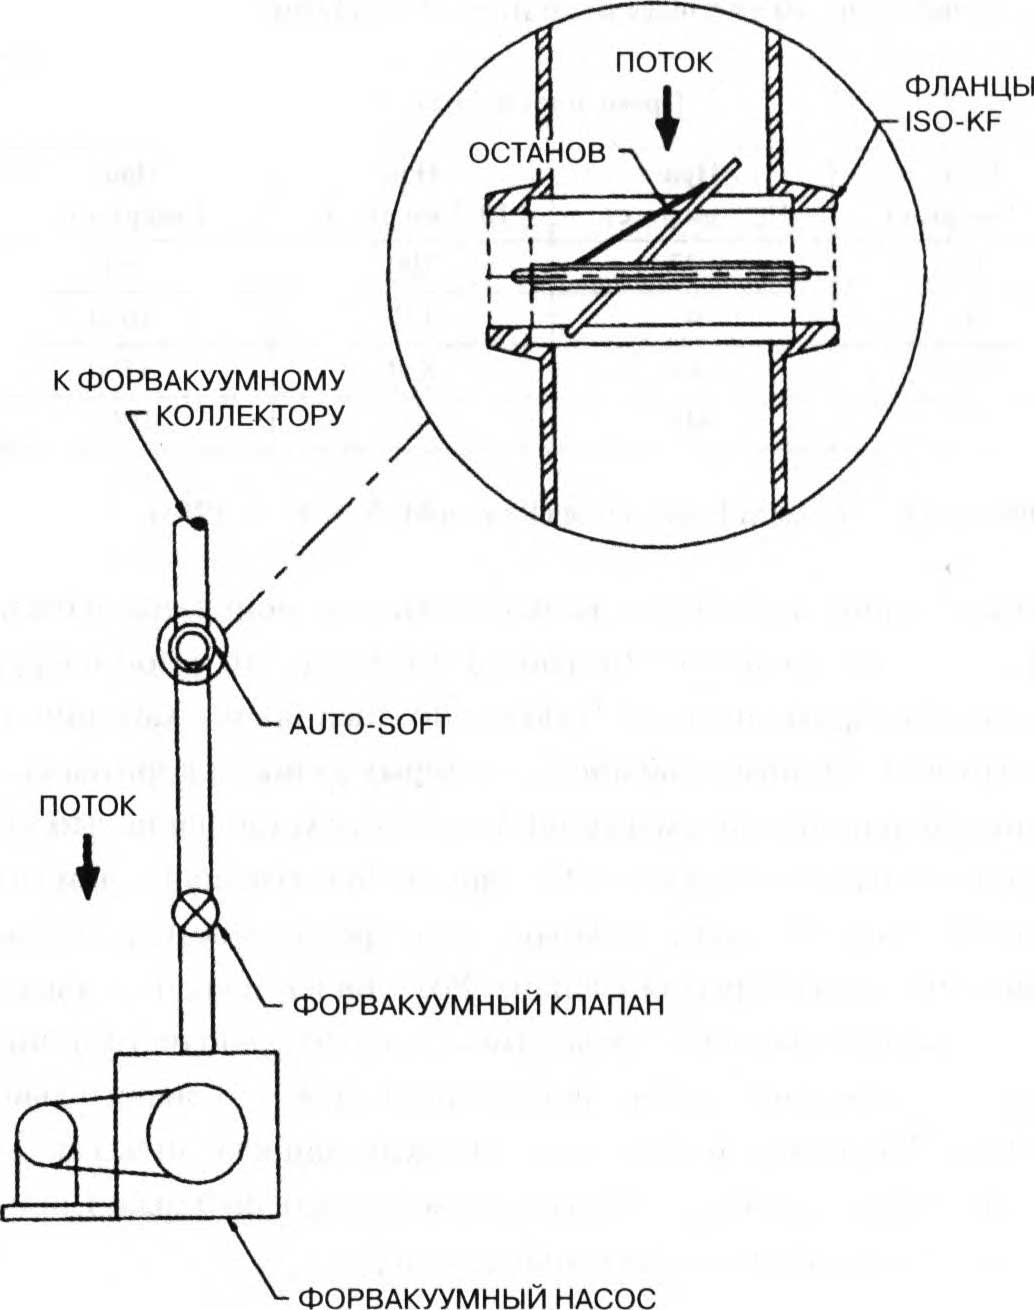 автоматический клапан для мягкого запуска форвакуумного насоса